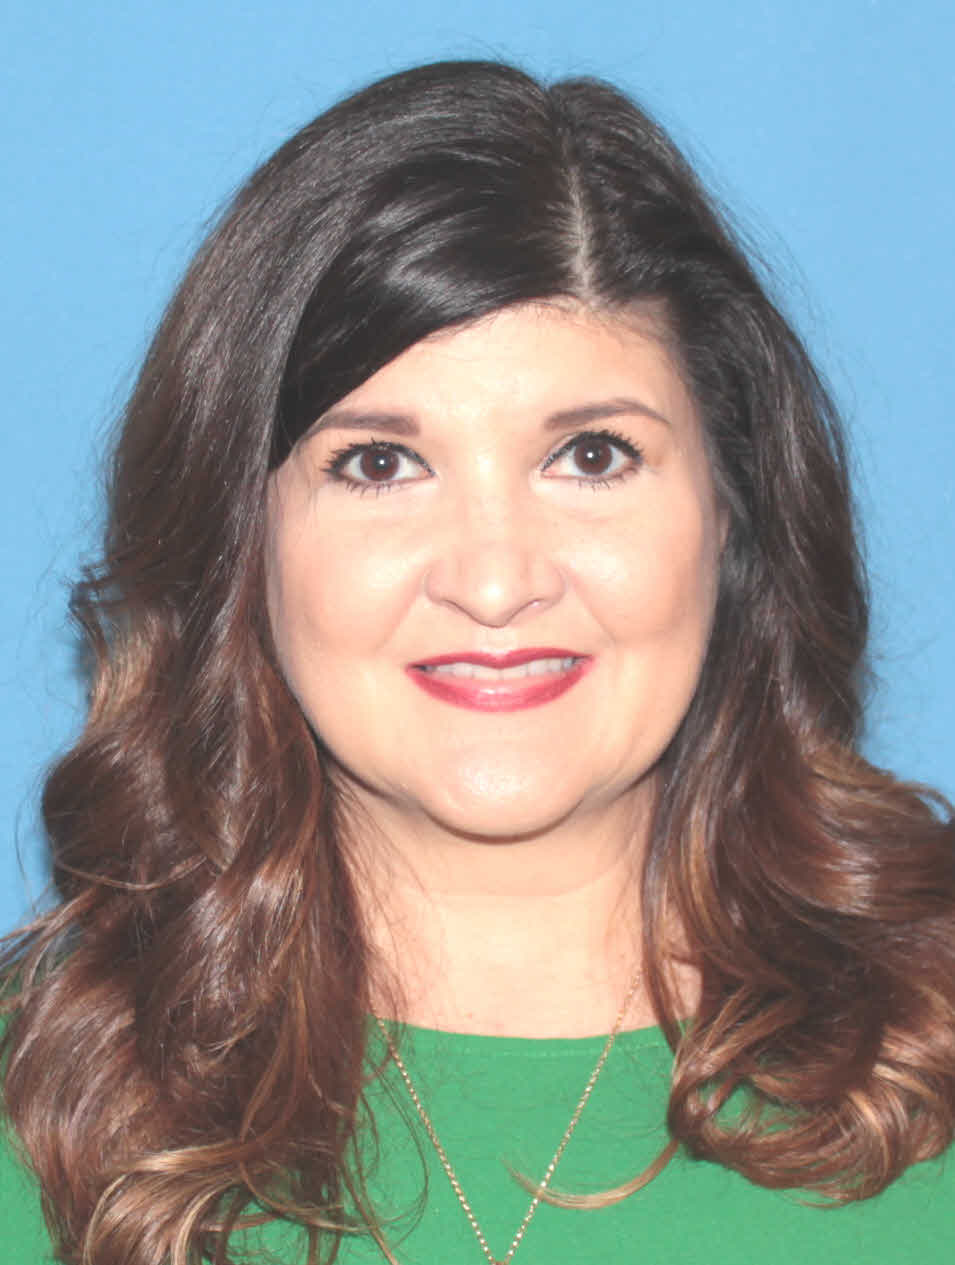 Andrew Trautmann Rosalynn Gutierrez S Profile